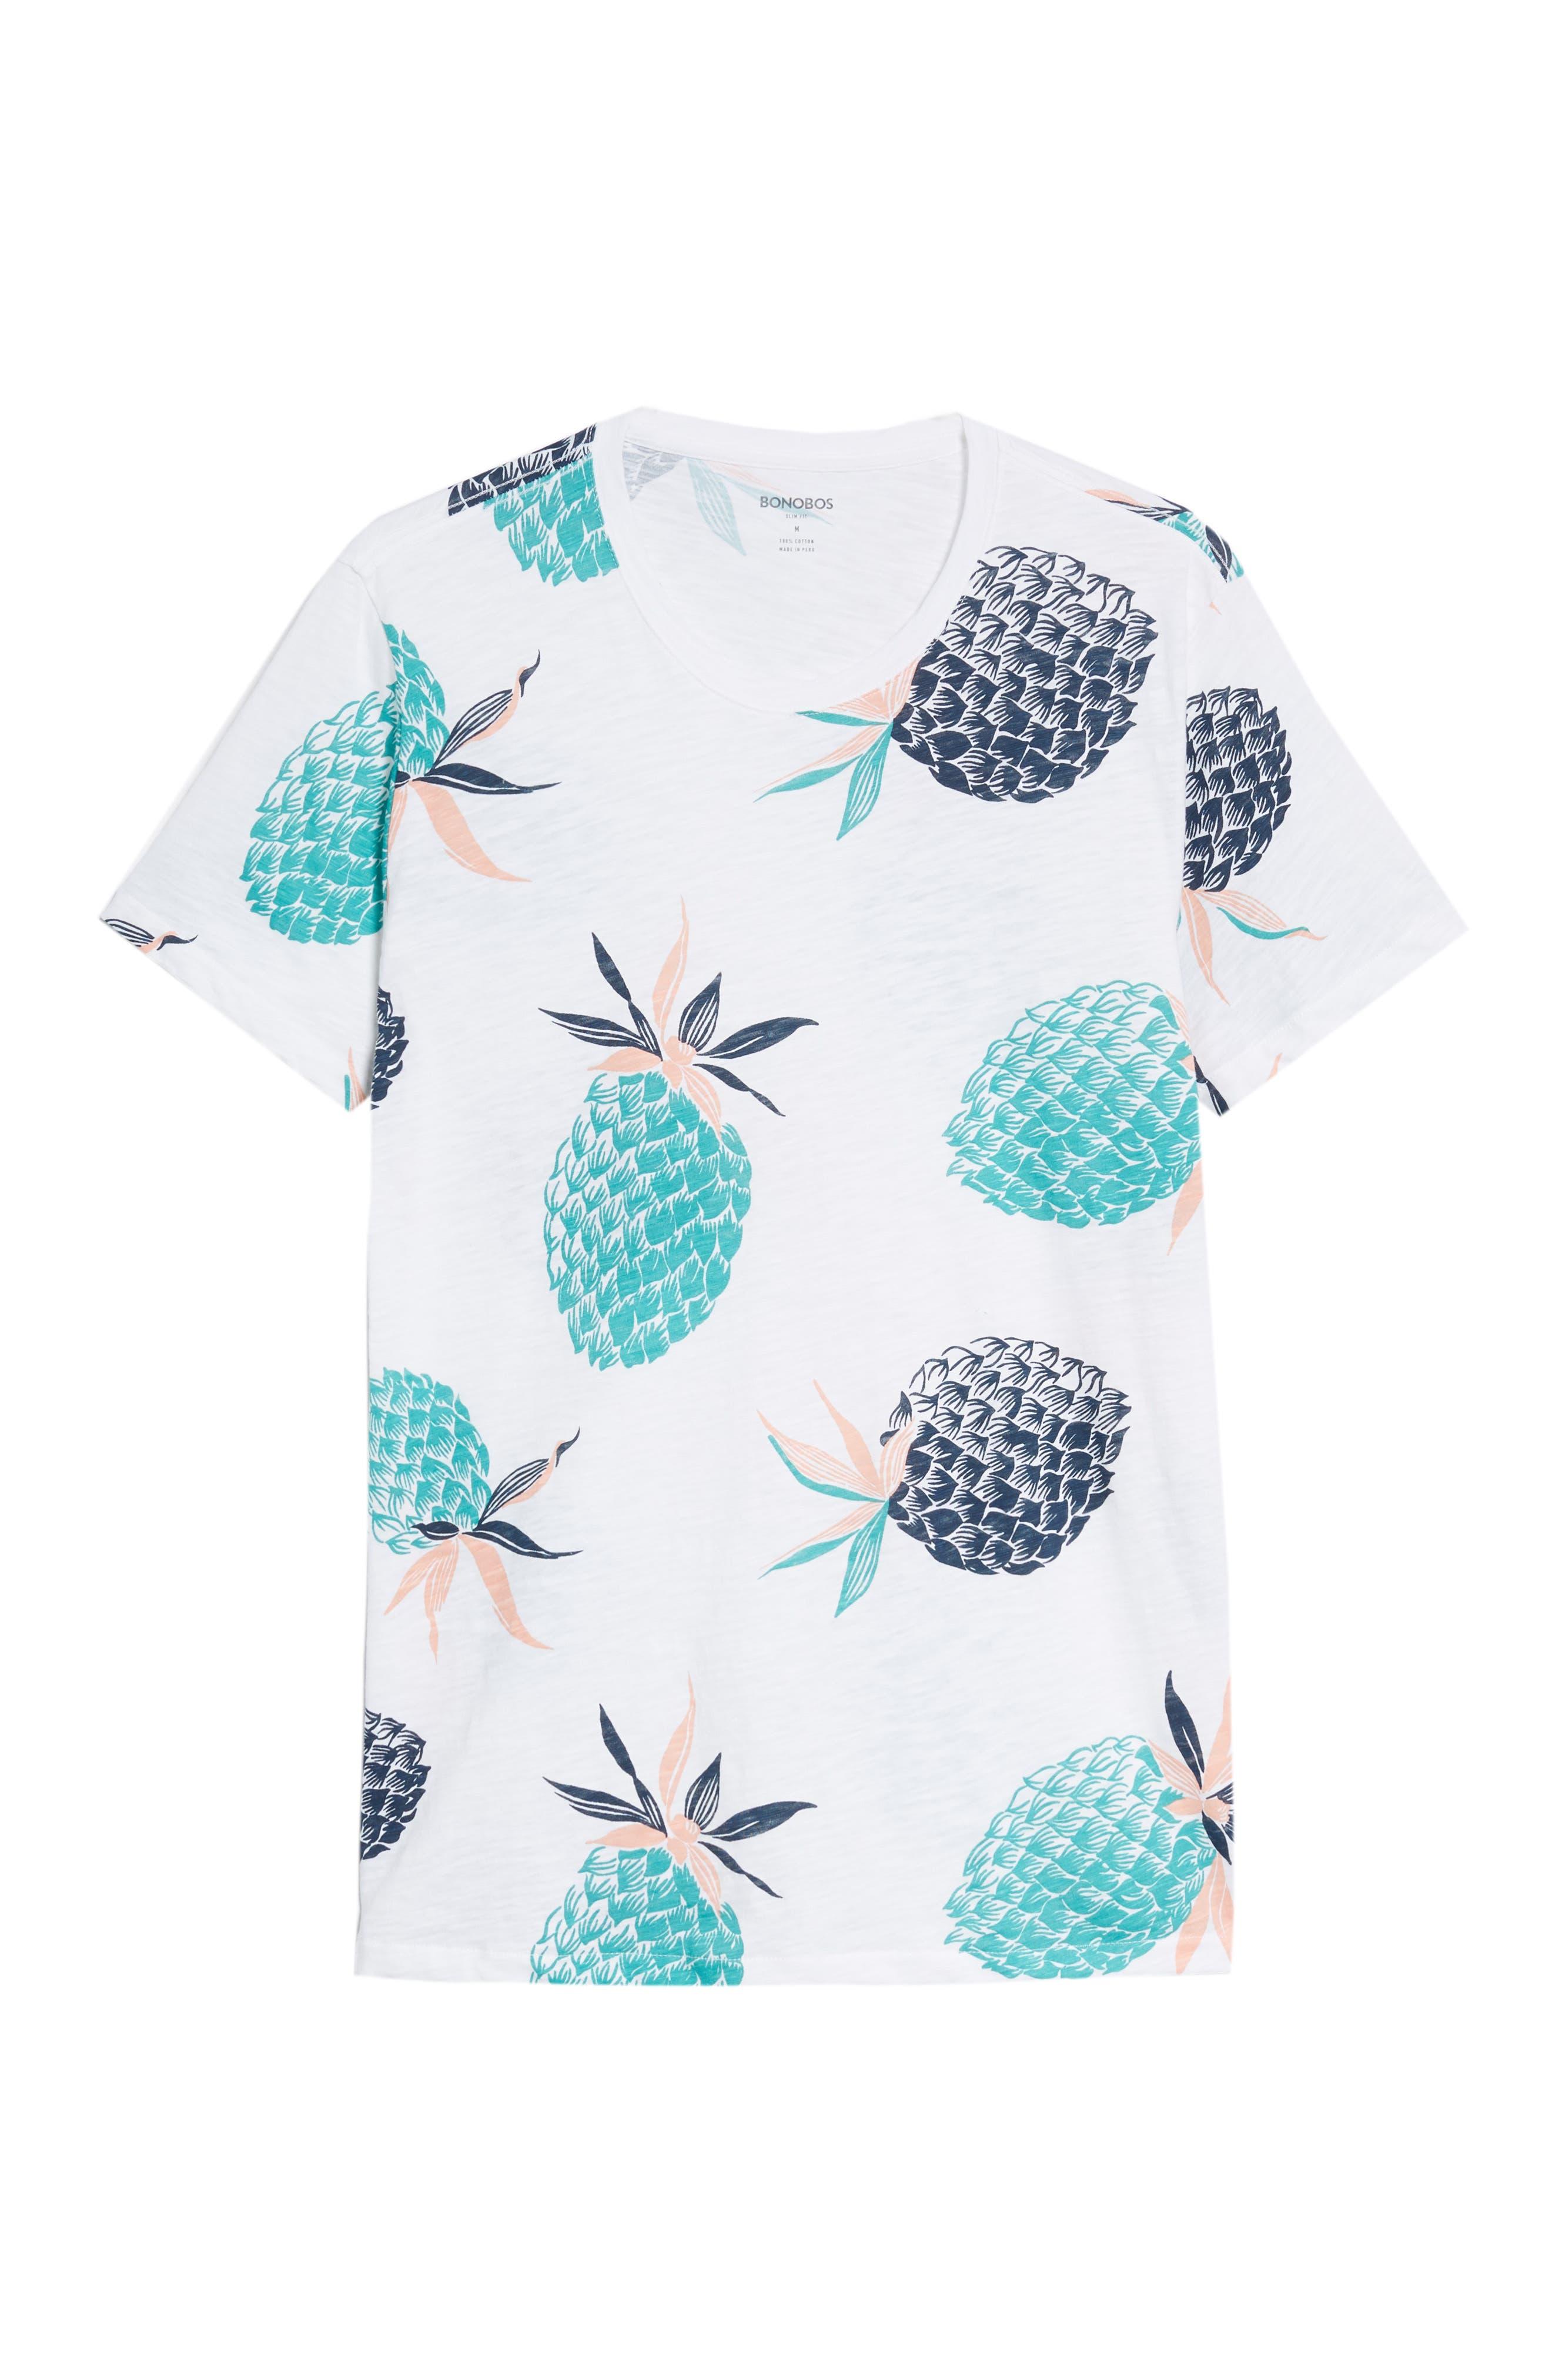 Pineapple Party Slim Fit T-Shirt,                             Alternate thumbnail 6, color,                             White/ Latigo Bay/ Sorbet